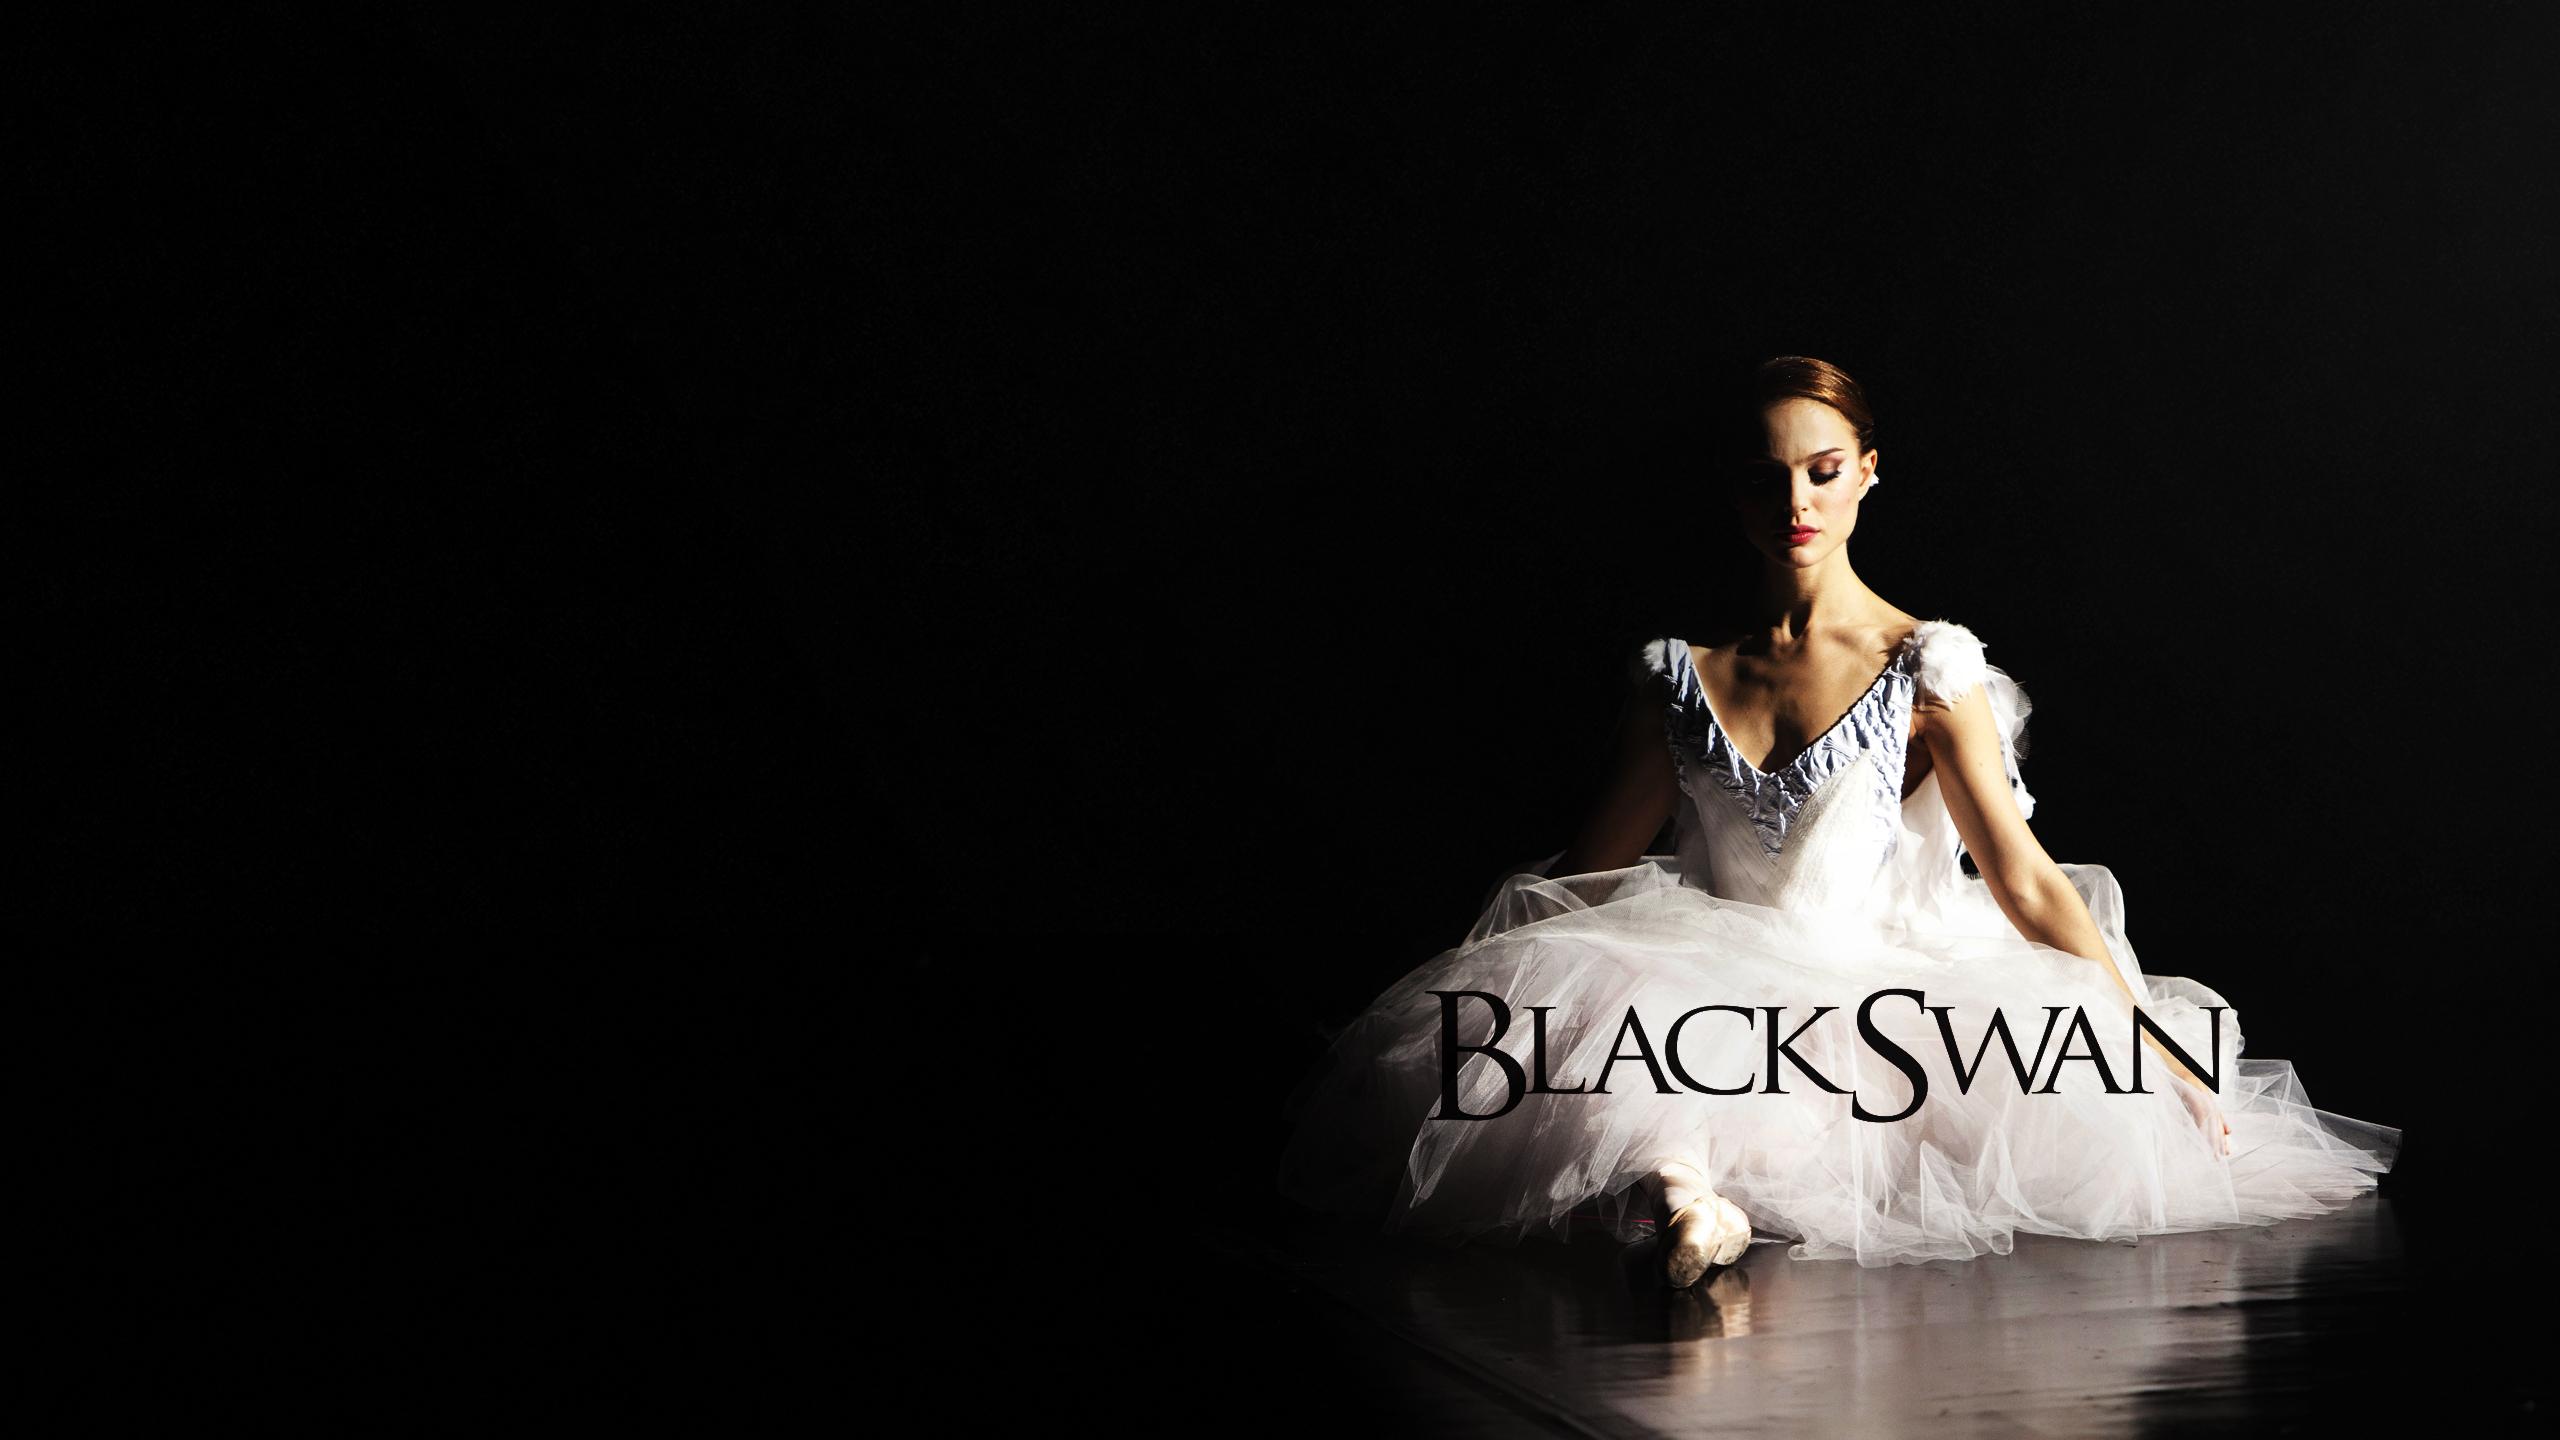 Black Swan Wallpapers 2560x1440